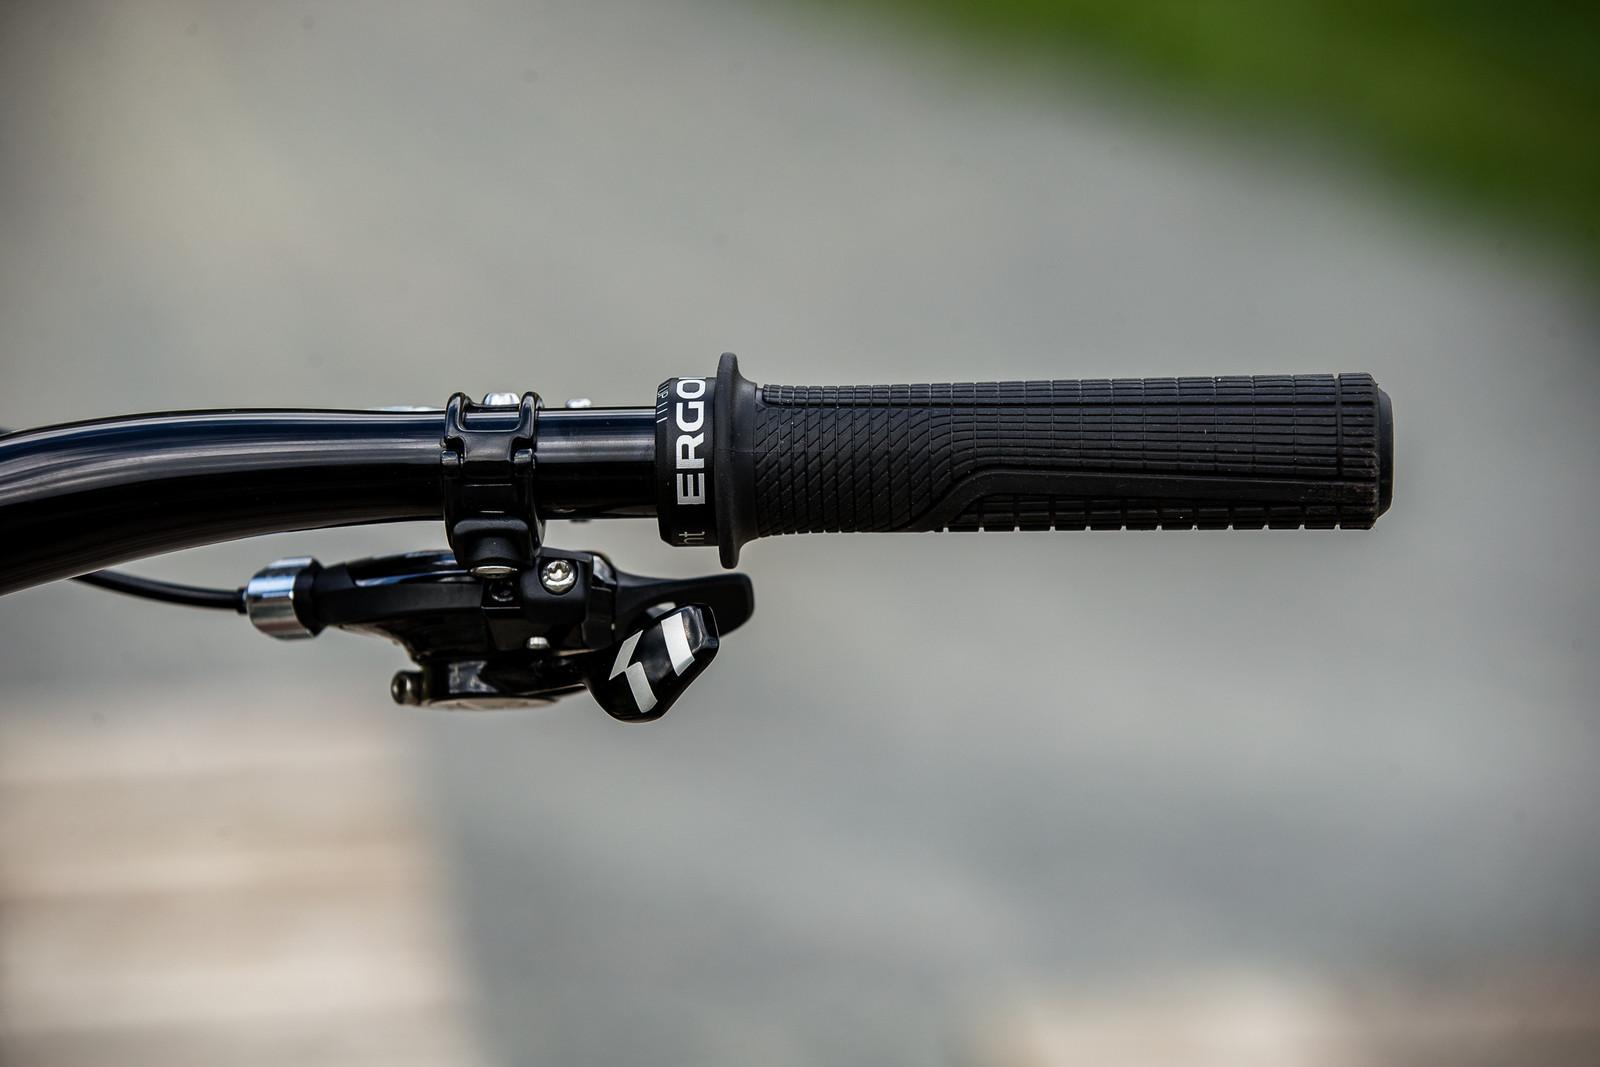 Ergon GD1 Grips, SRAM X0 DH Shifter - WINNING BIKE - Vali Höll's YT TUES - Mountain Biking Pictures - Vital MTB